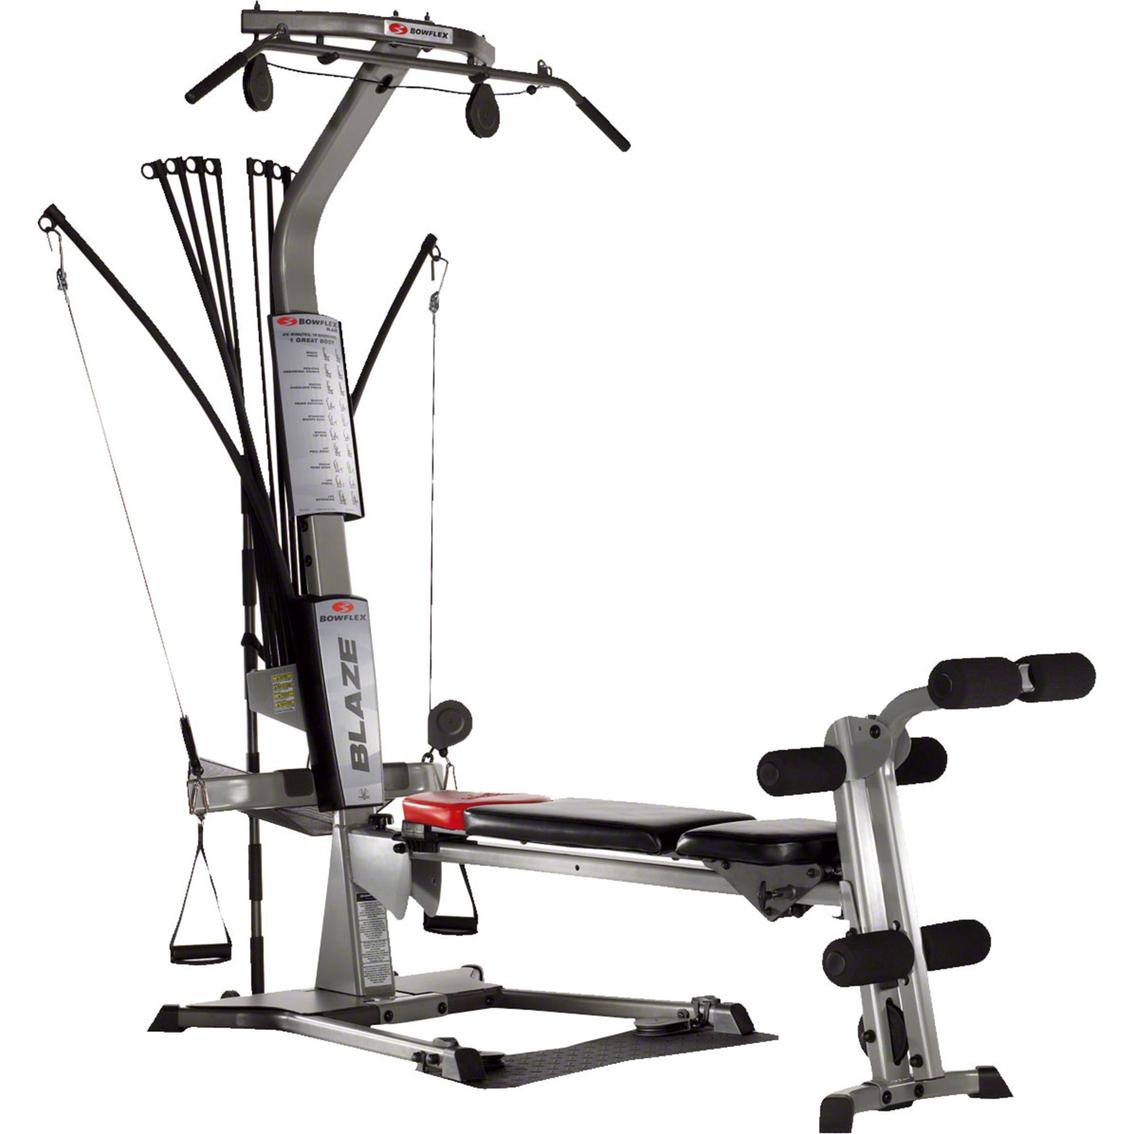 Bowflow Exercises